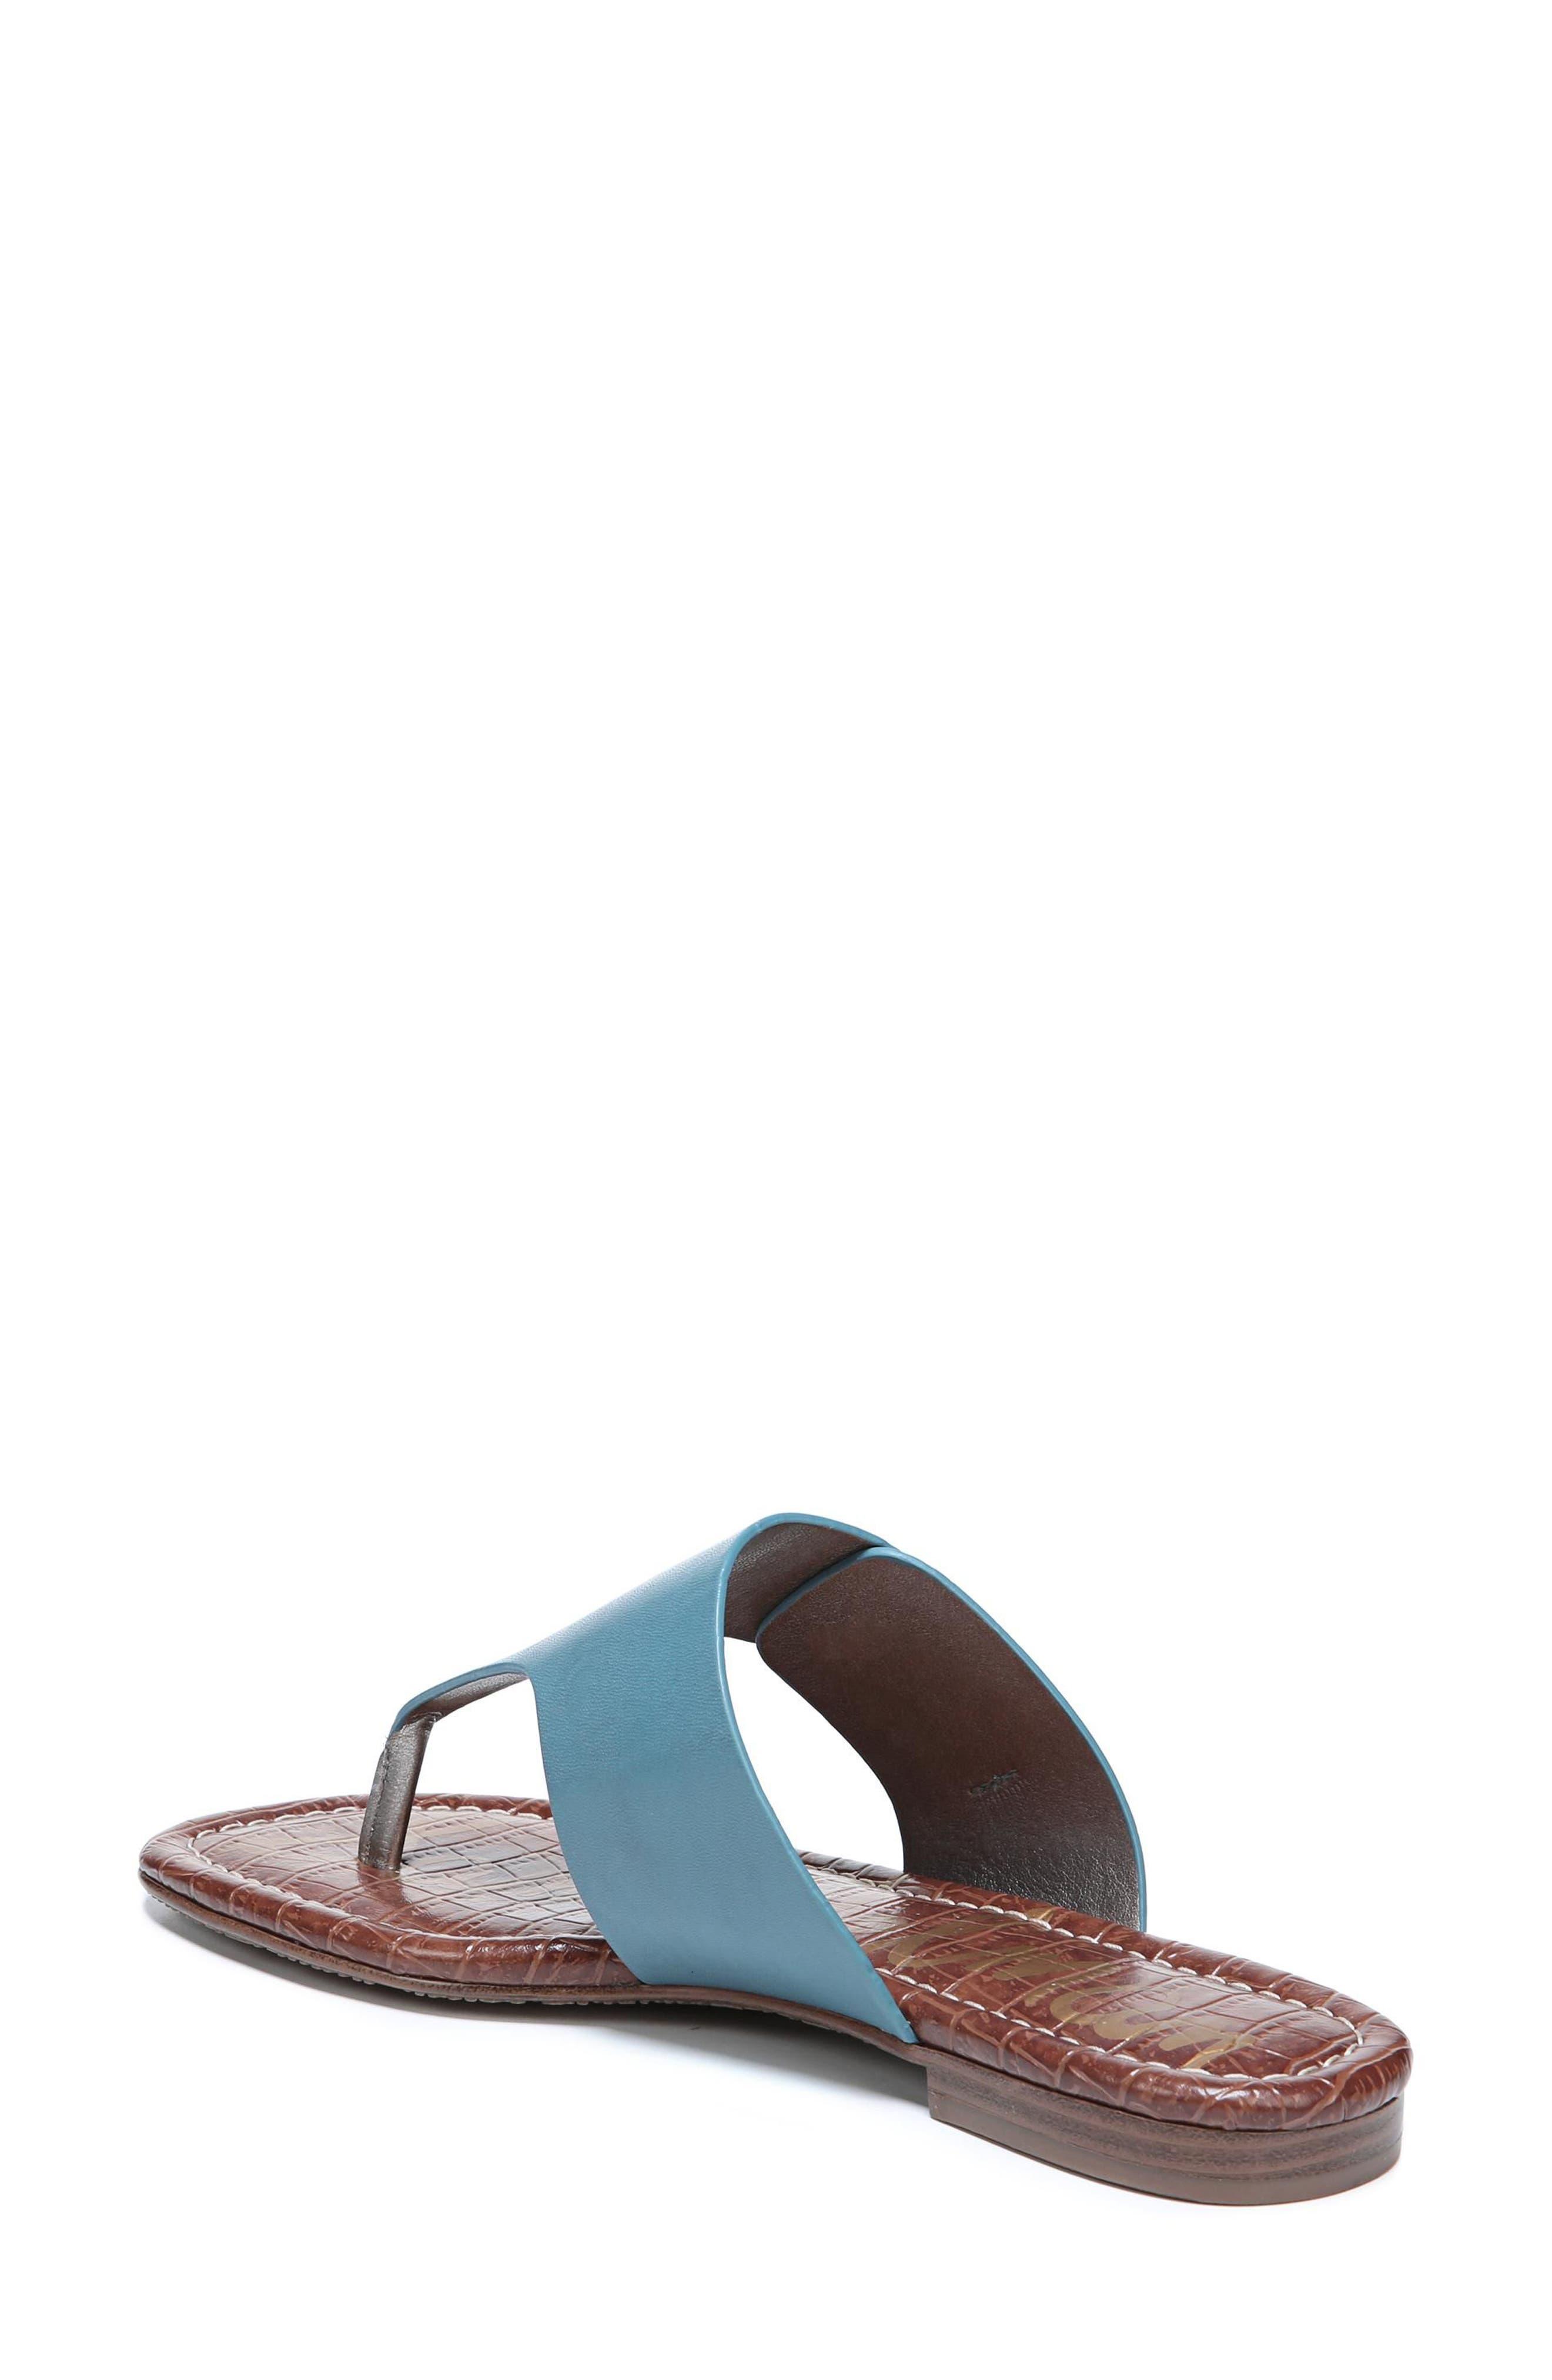 Barry V-Strap Thong Sandal,                             Alternate thumbnail 2, color,                             Denim Blue Leather